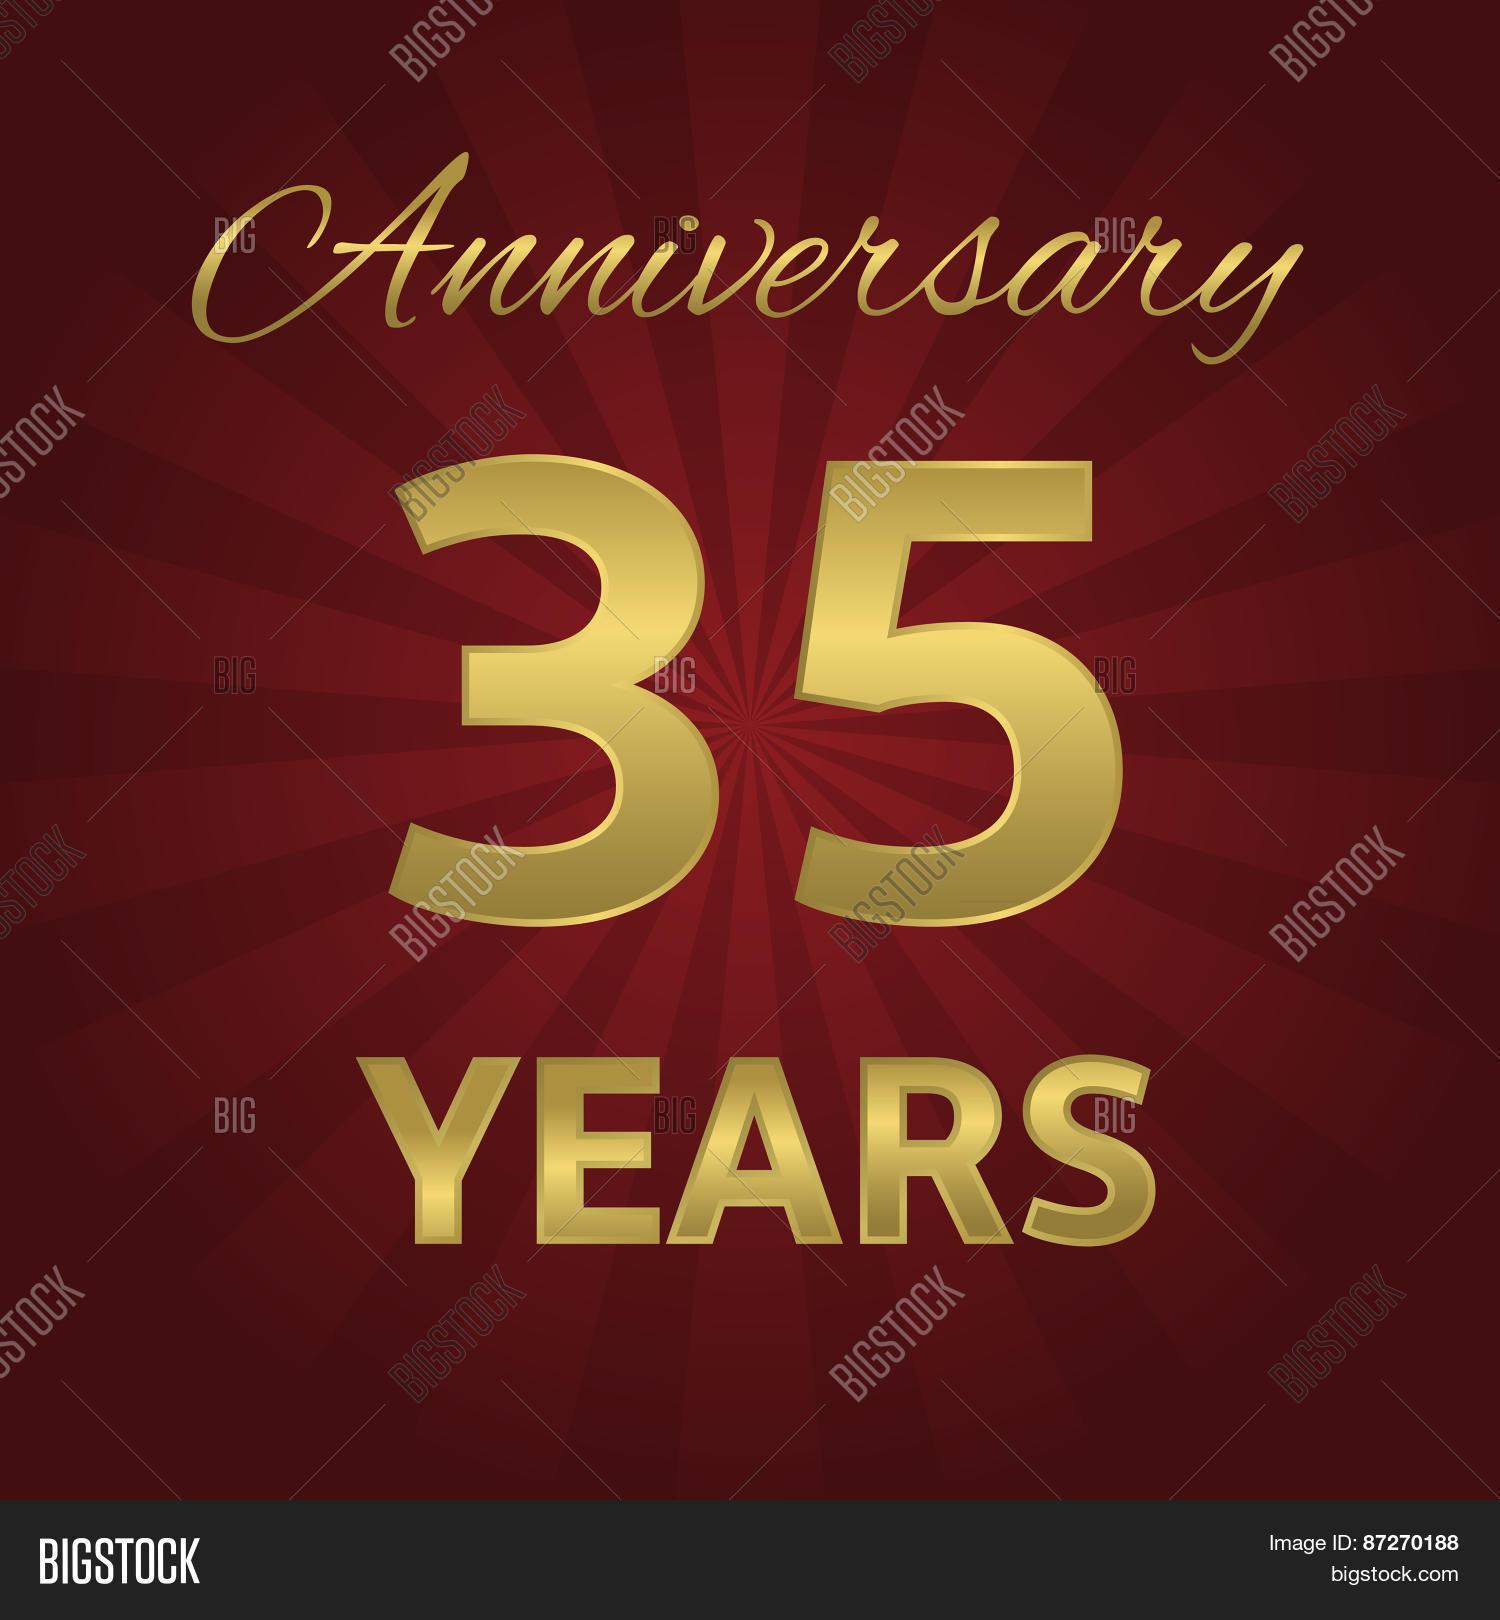 35 Years Anniversary Vector Photo Free Trial Bigstock